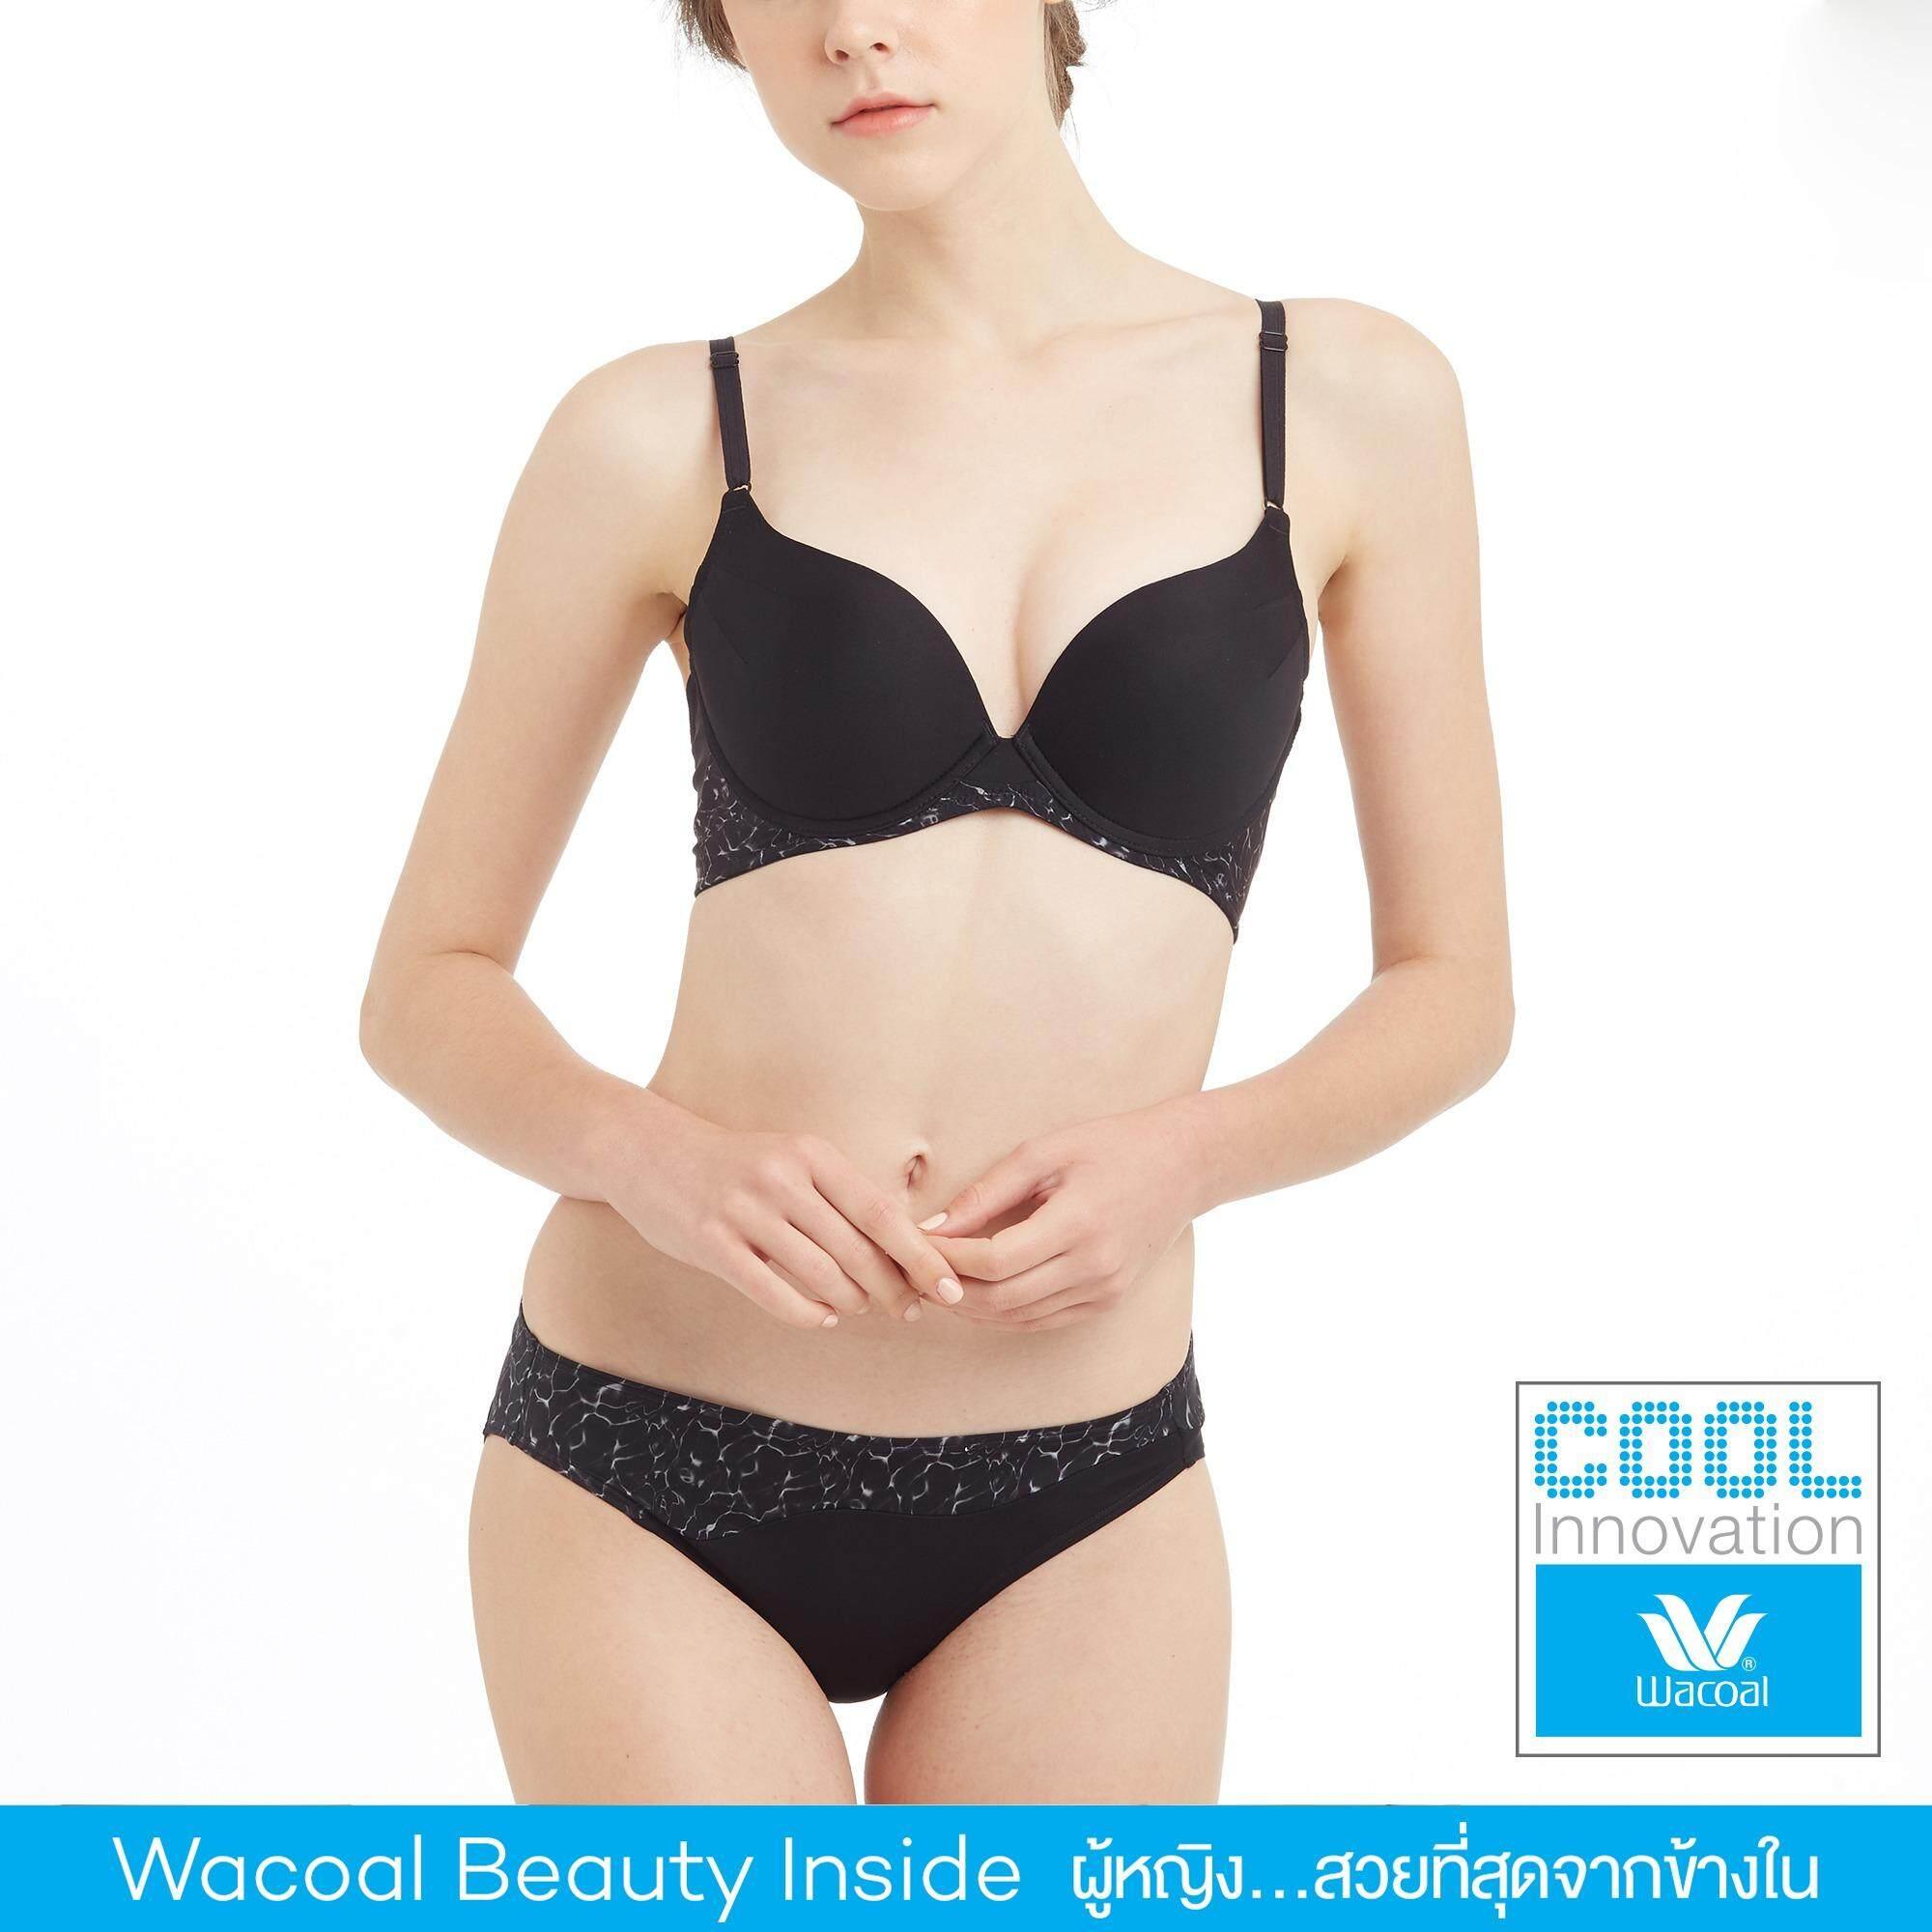 Wacoal Cool innovation เซ็ทชุดชั้นในกางเกงชั้นใน Push up Bra 3/4 Cup (สีดำ/BLACK) - WB3K22BL-W63K22BL